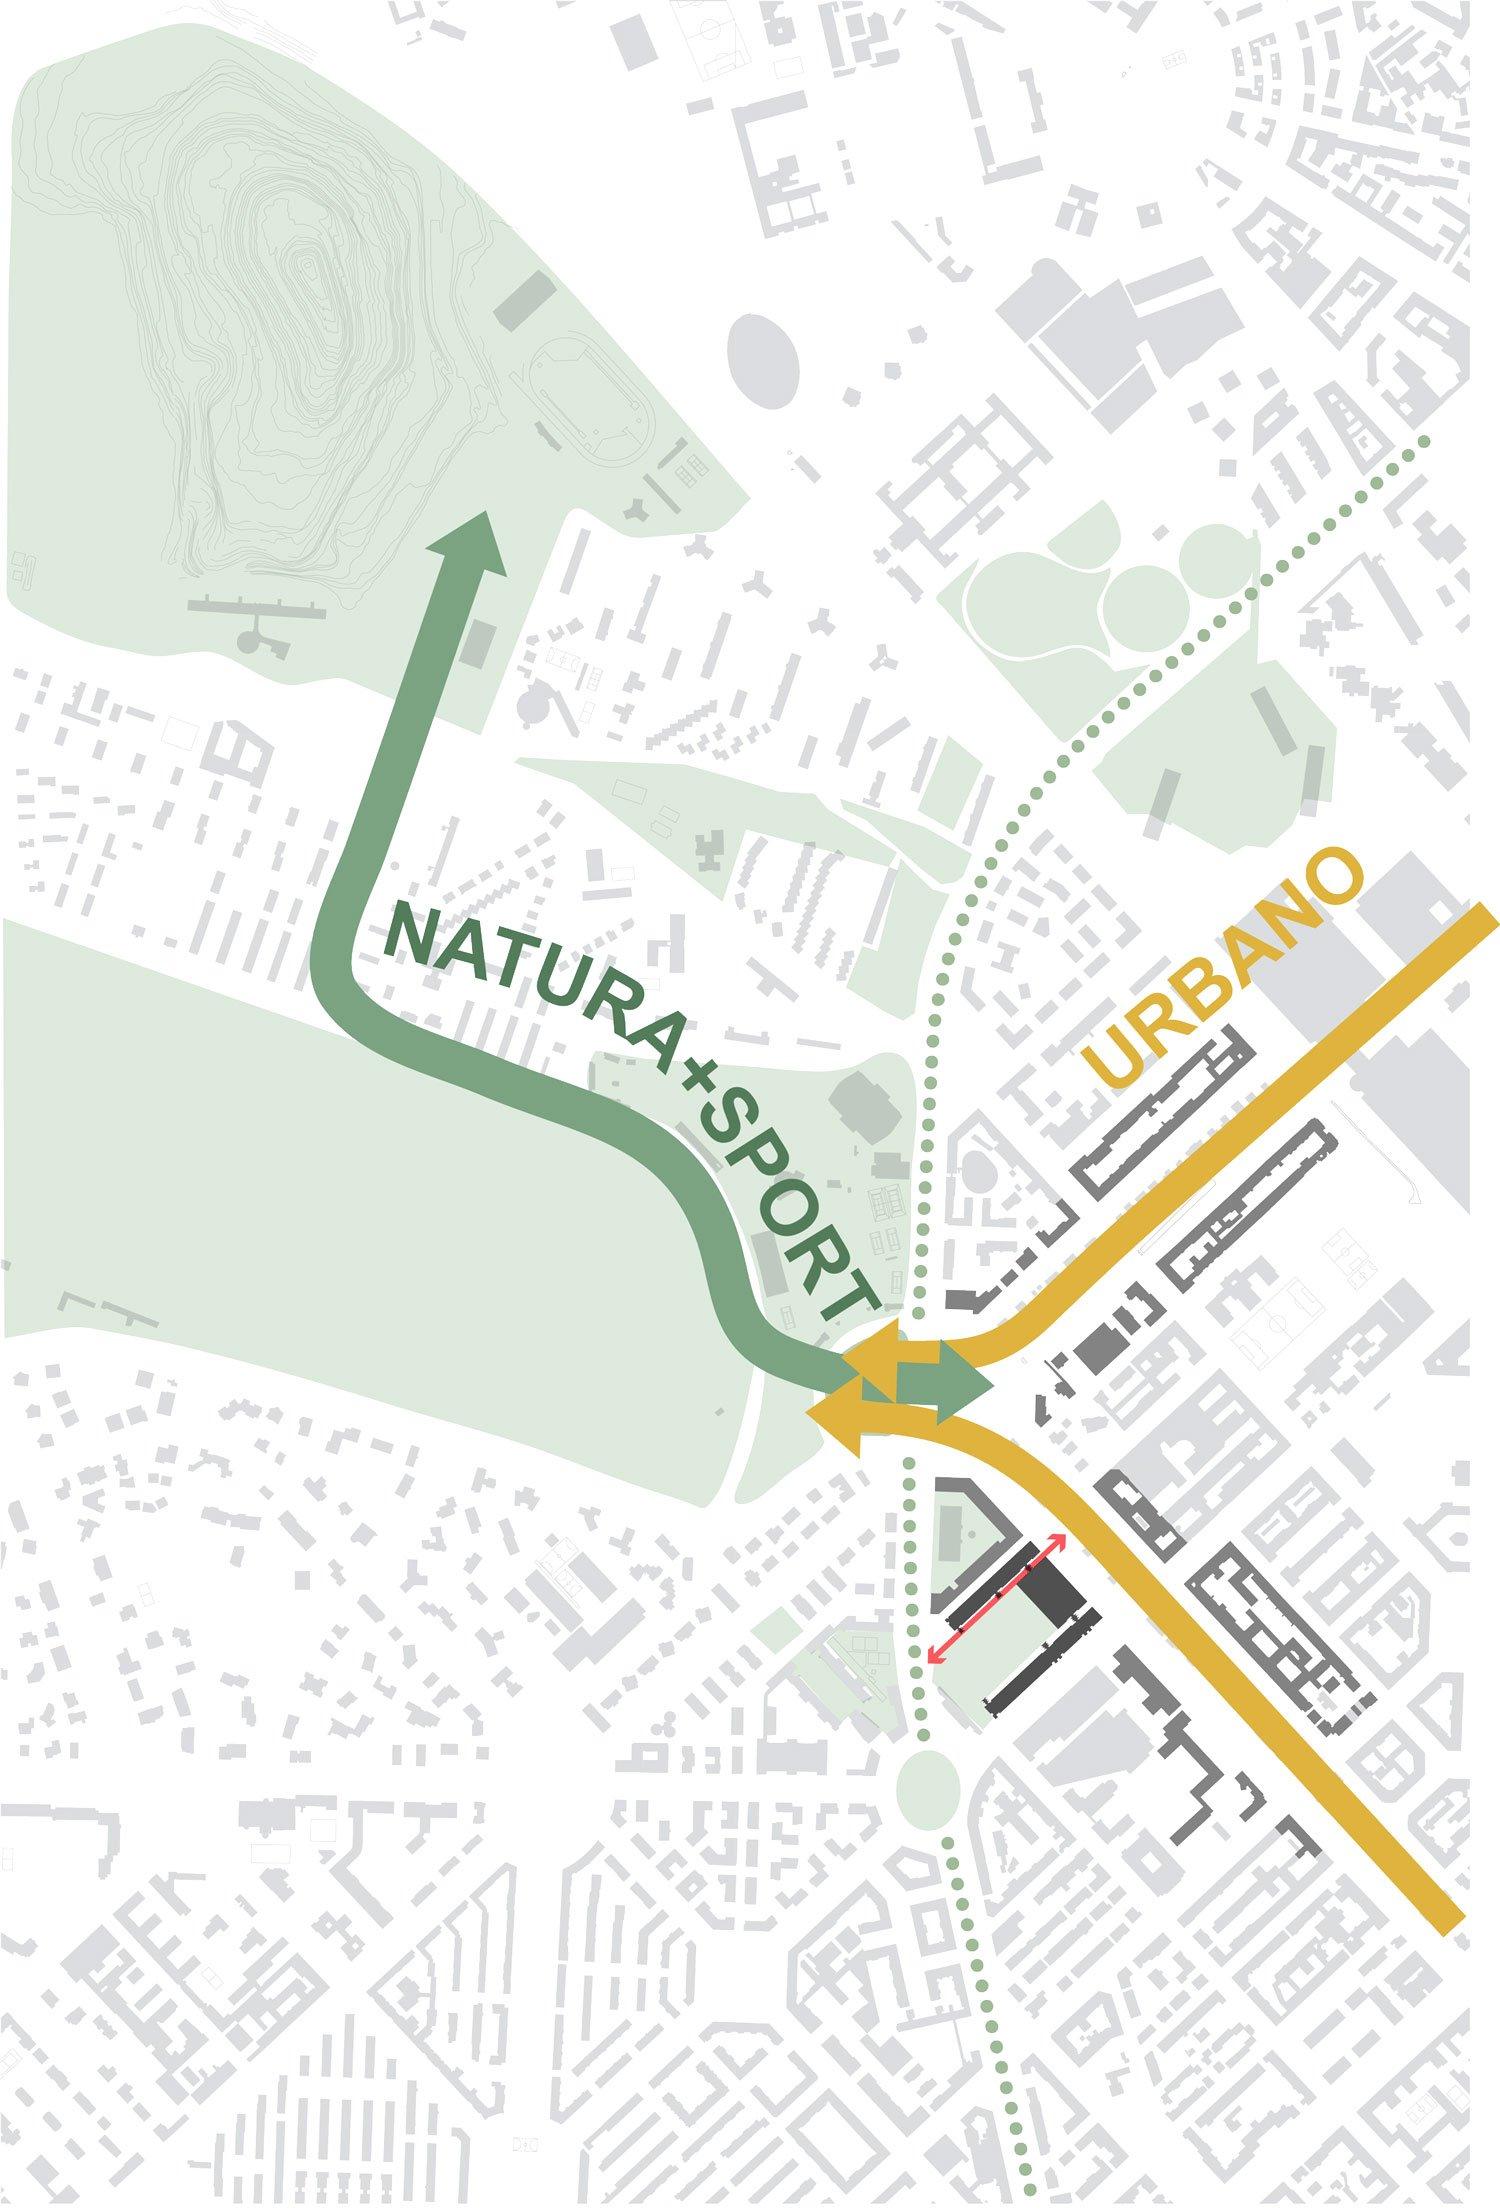 Urban_training_Nature+urban-planning Il Prisma}